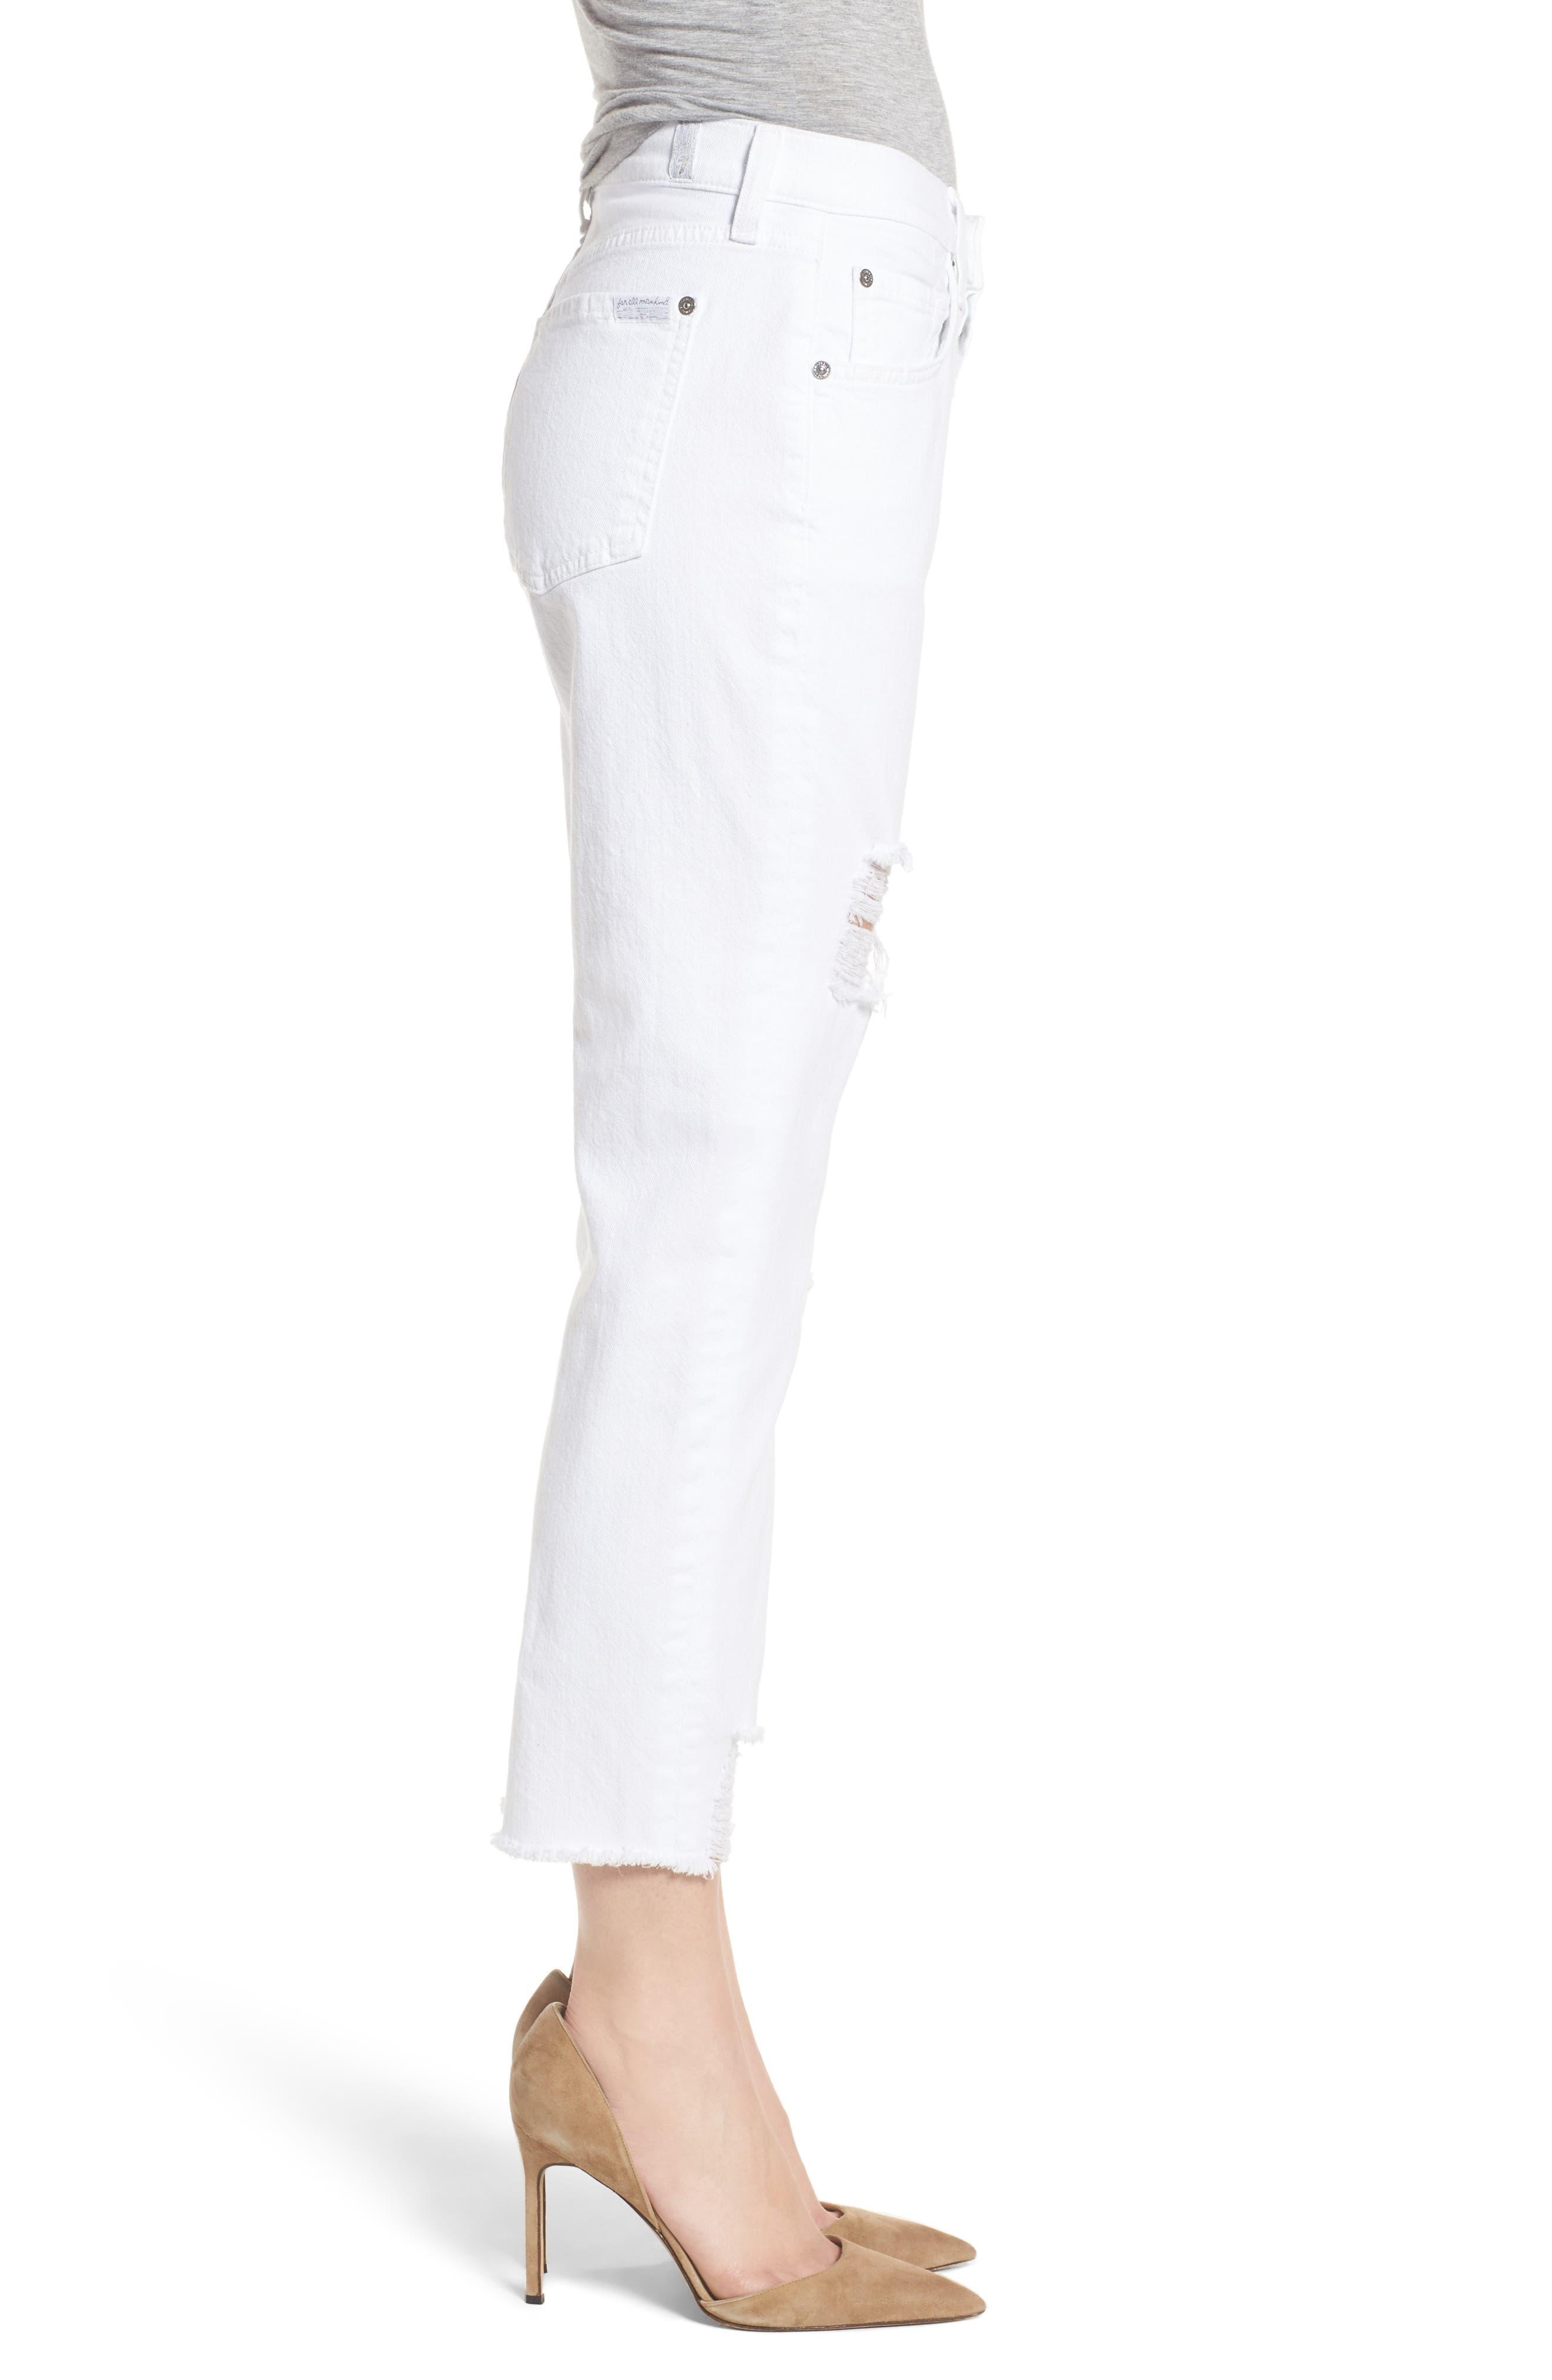 Josefina High Waist Boyfriend Jeans,                             Alternate thumbnail 3, color,                             White Fashion 2